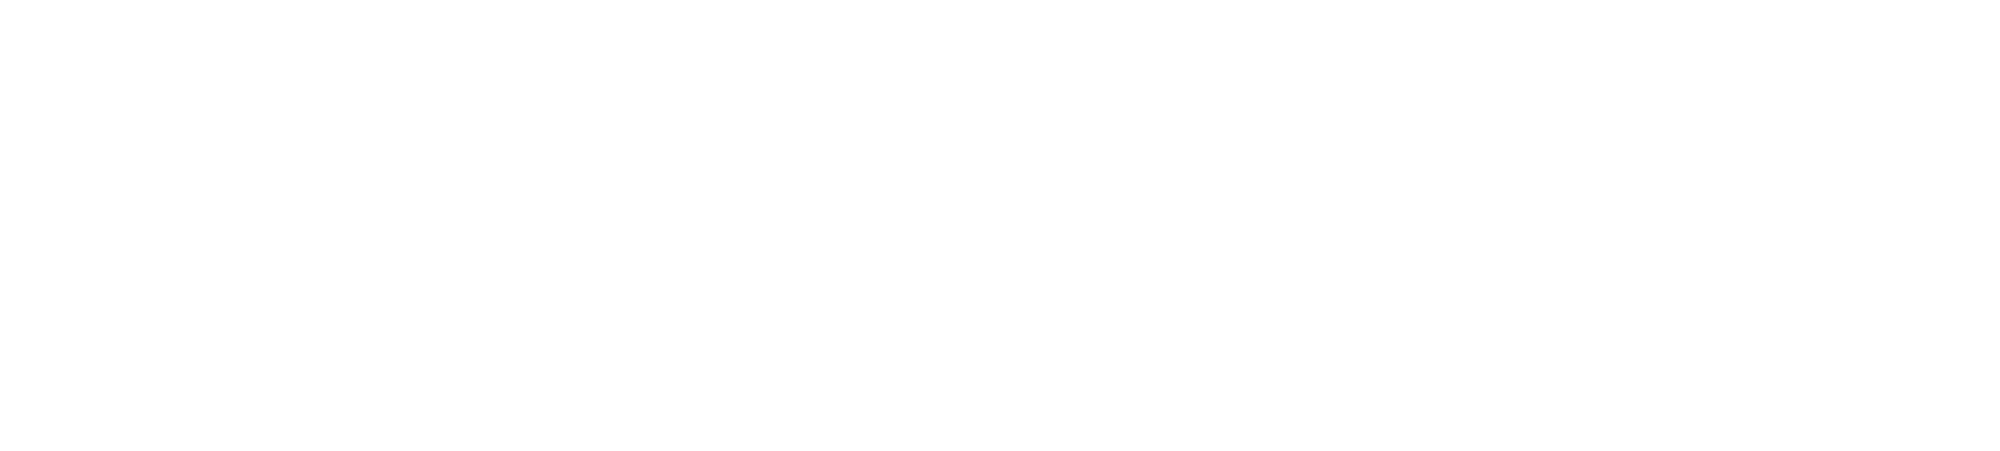 BigCommerce Scalable Enterprise Commerce Solutions